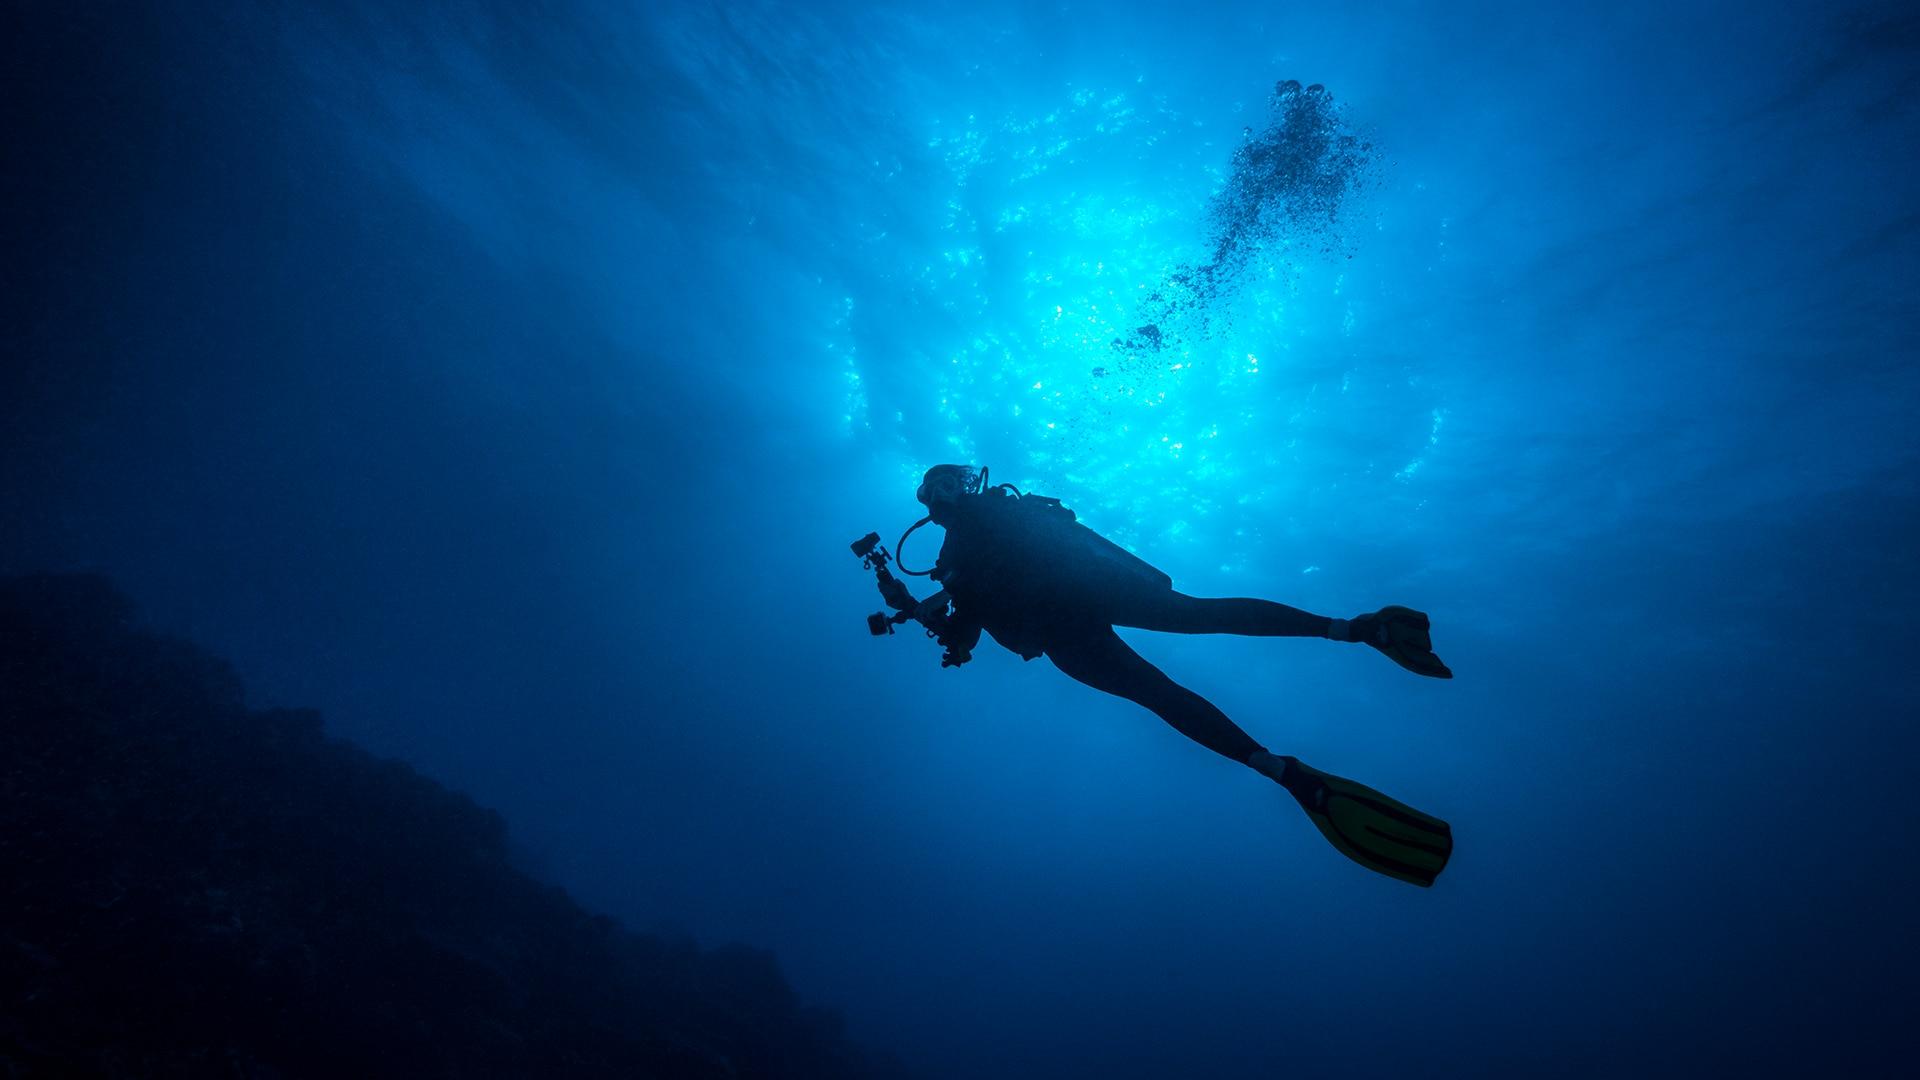 Diver swimming in the ocean